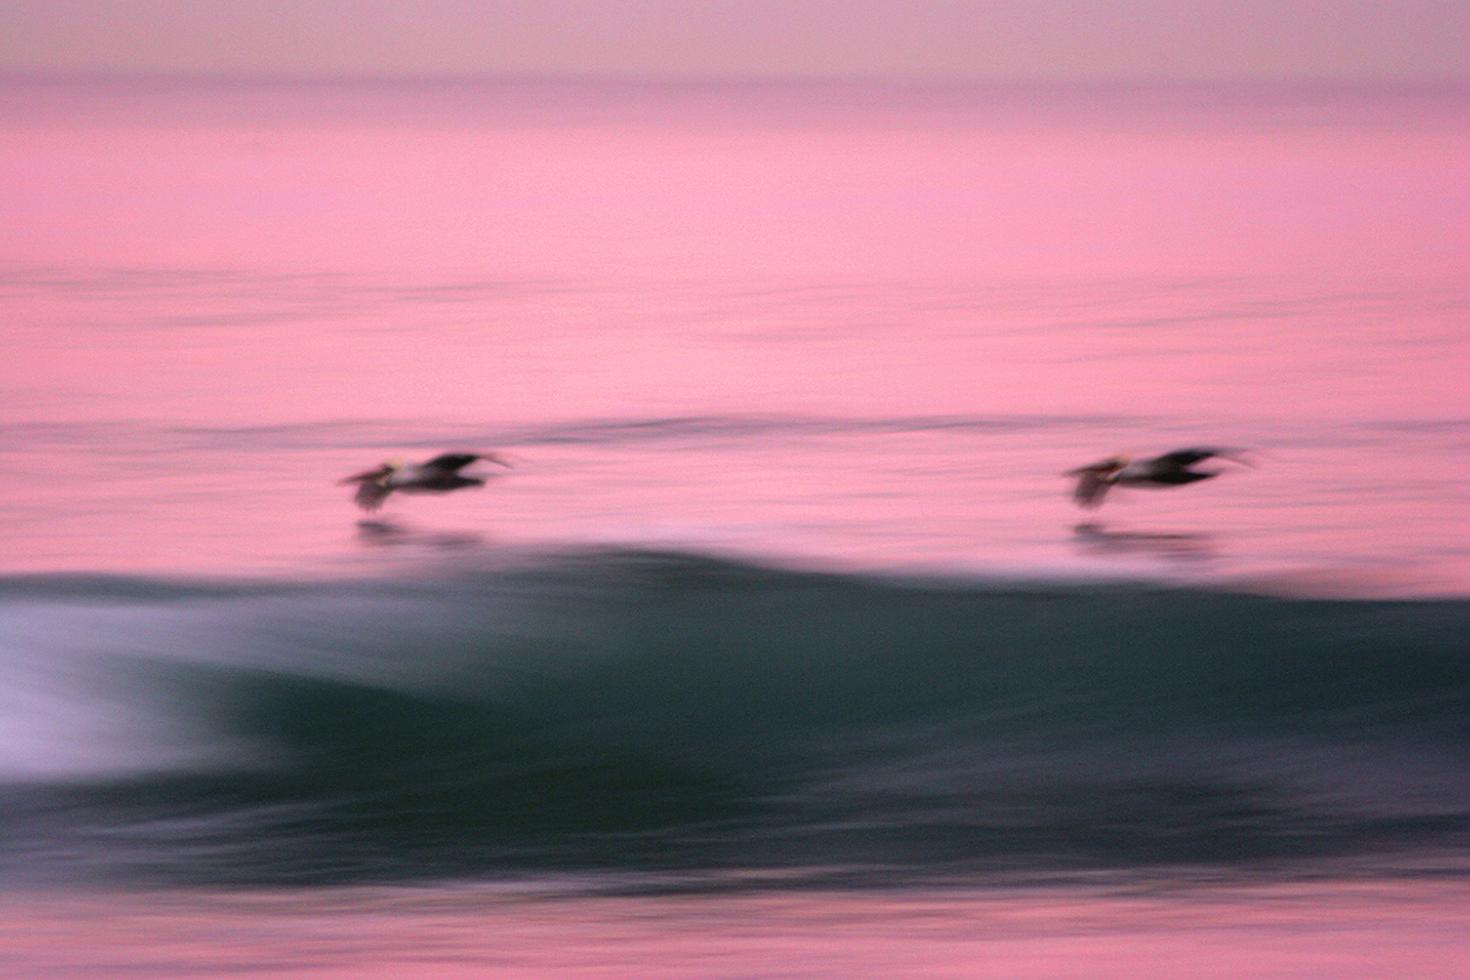 Dawn Patrol Pelicans